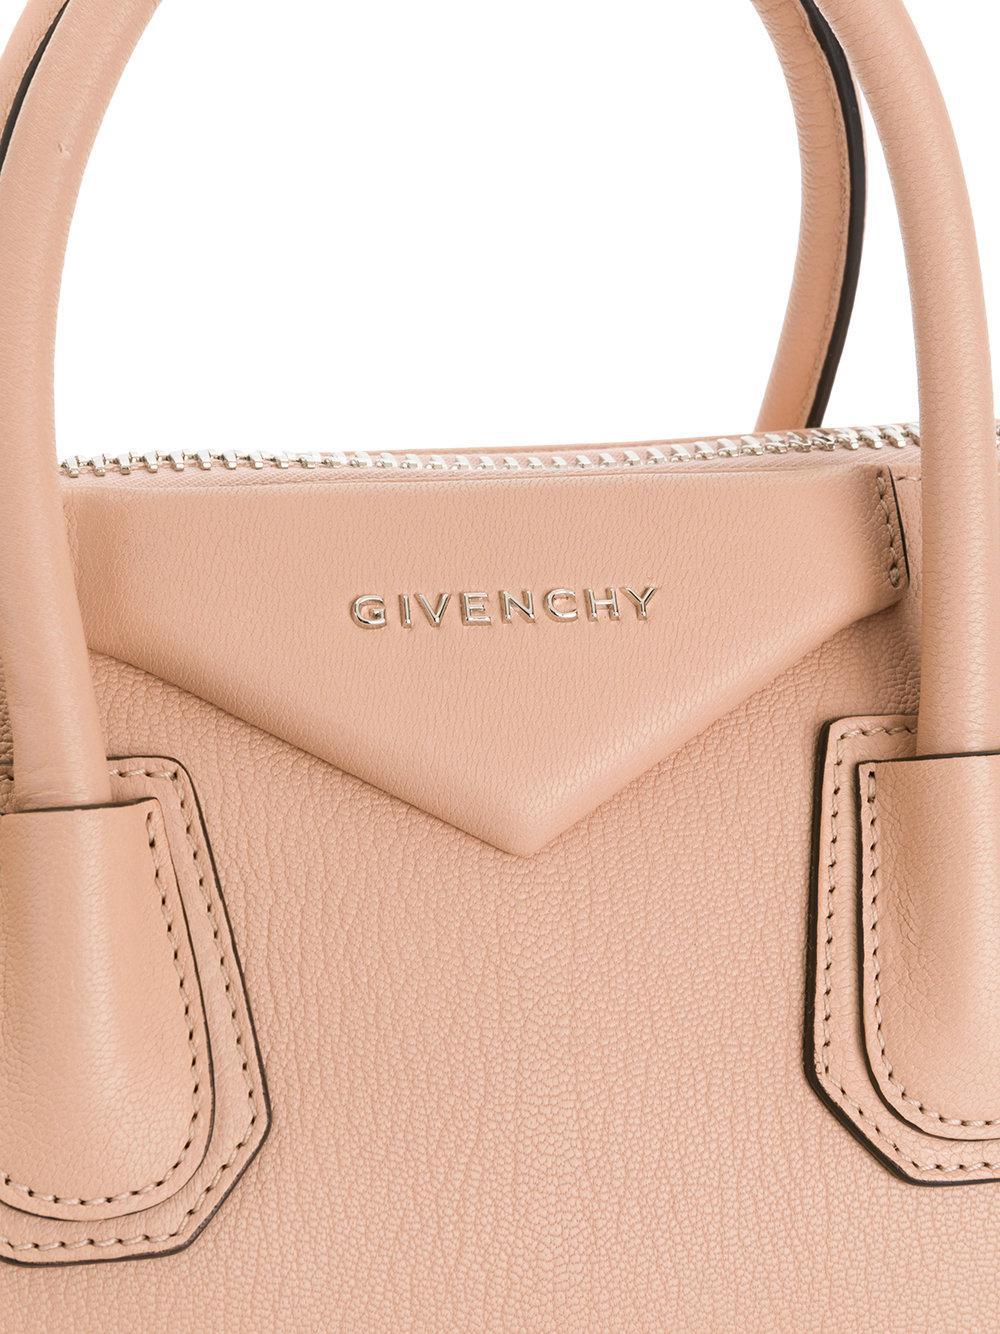 Givenchy - Natural Antigona Bag - Lyst. View fullscreen bed0baf13d